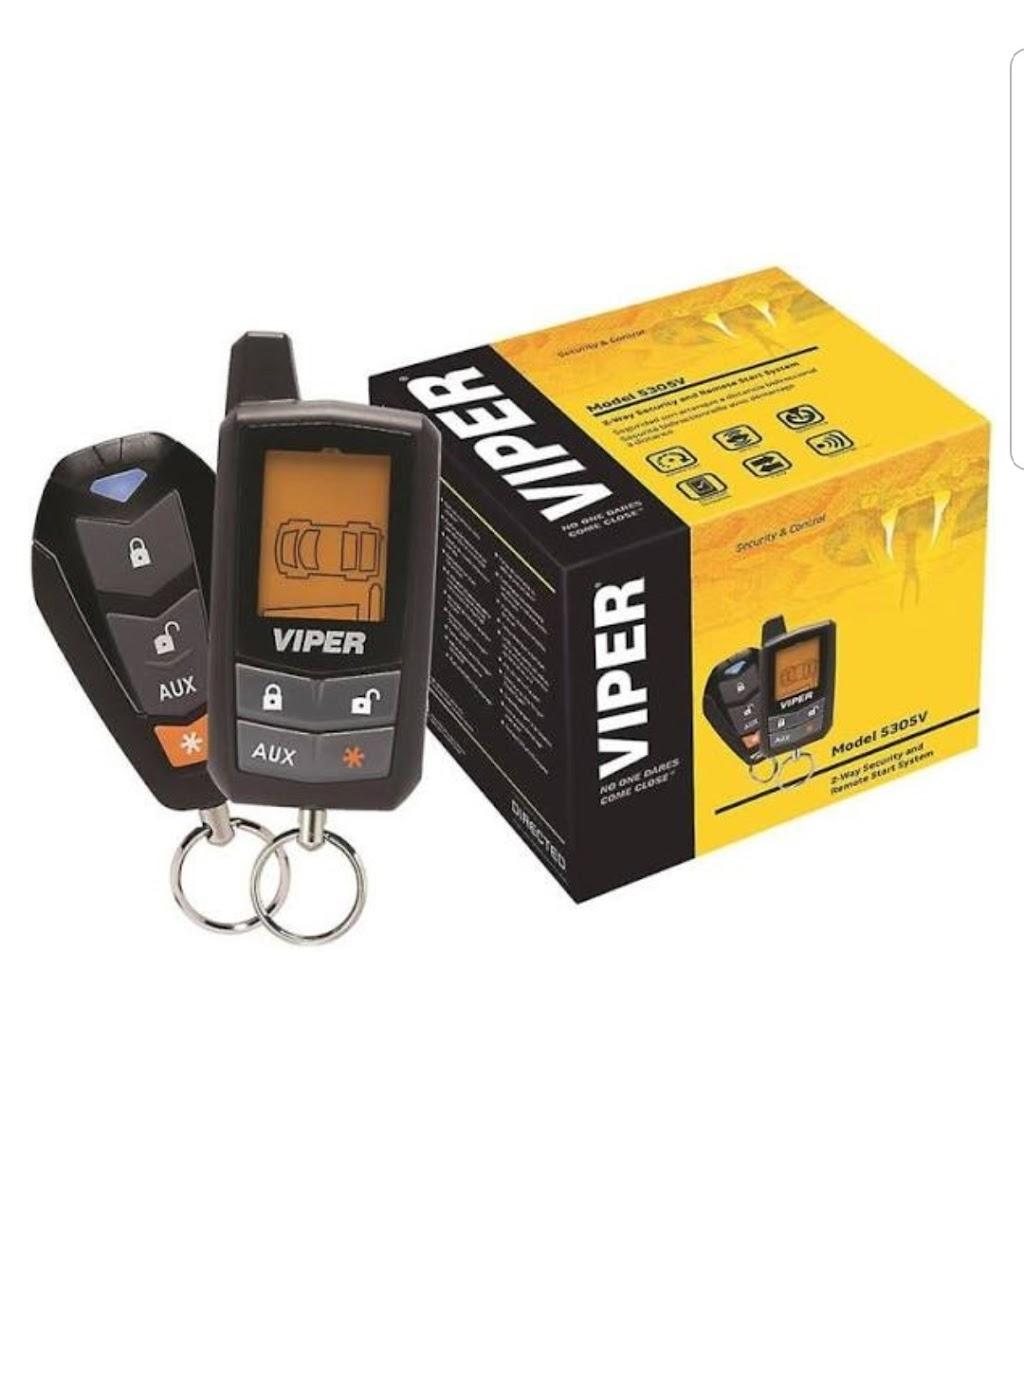 Highspeedautosound - electronics store  | Photo 10 of 10 | Address: 1473 Jerome Ave, Bronx, NY 10452, USA | Phone: (718) 992-5297